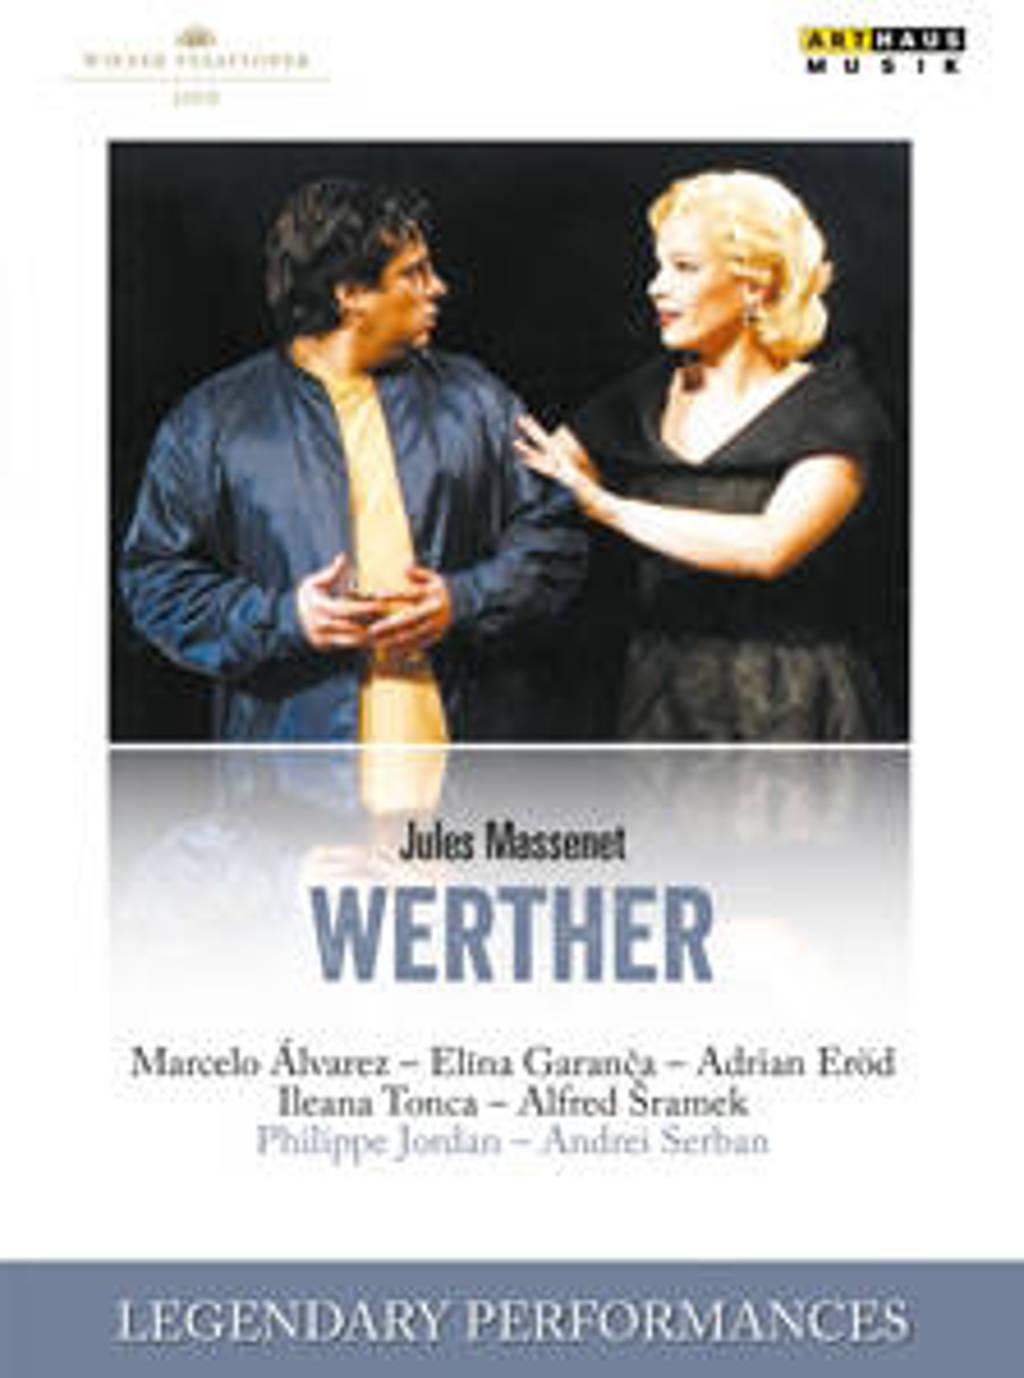 Alvarez, Caranca, Erod - Legendary Performances Werther Wene (DVD)